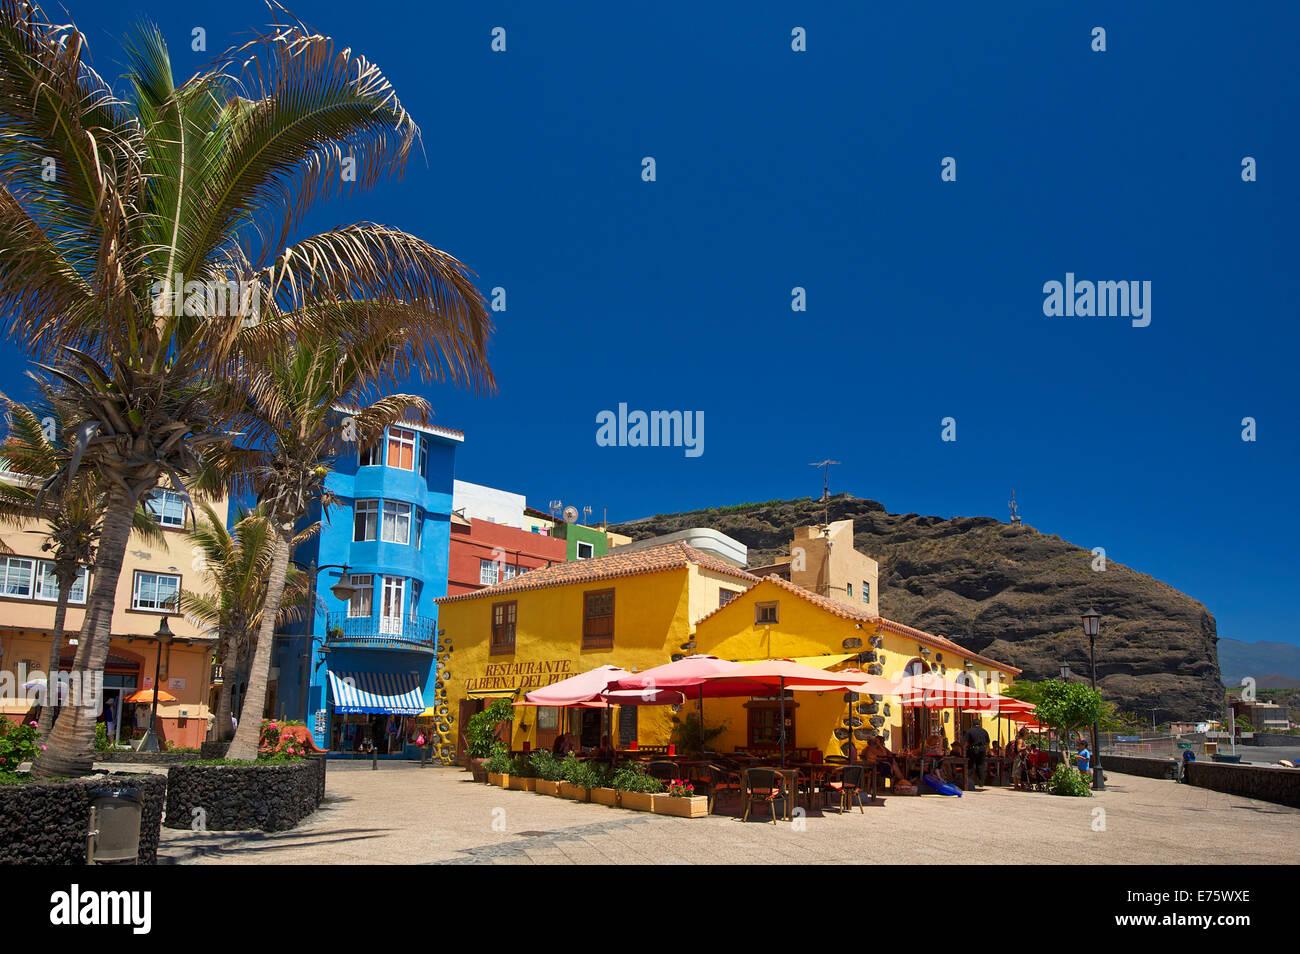 Taberna del Puerto, Puerto de Tazacorte, La Palma, Kanarische Inseln, Spanien Stockbild